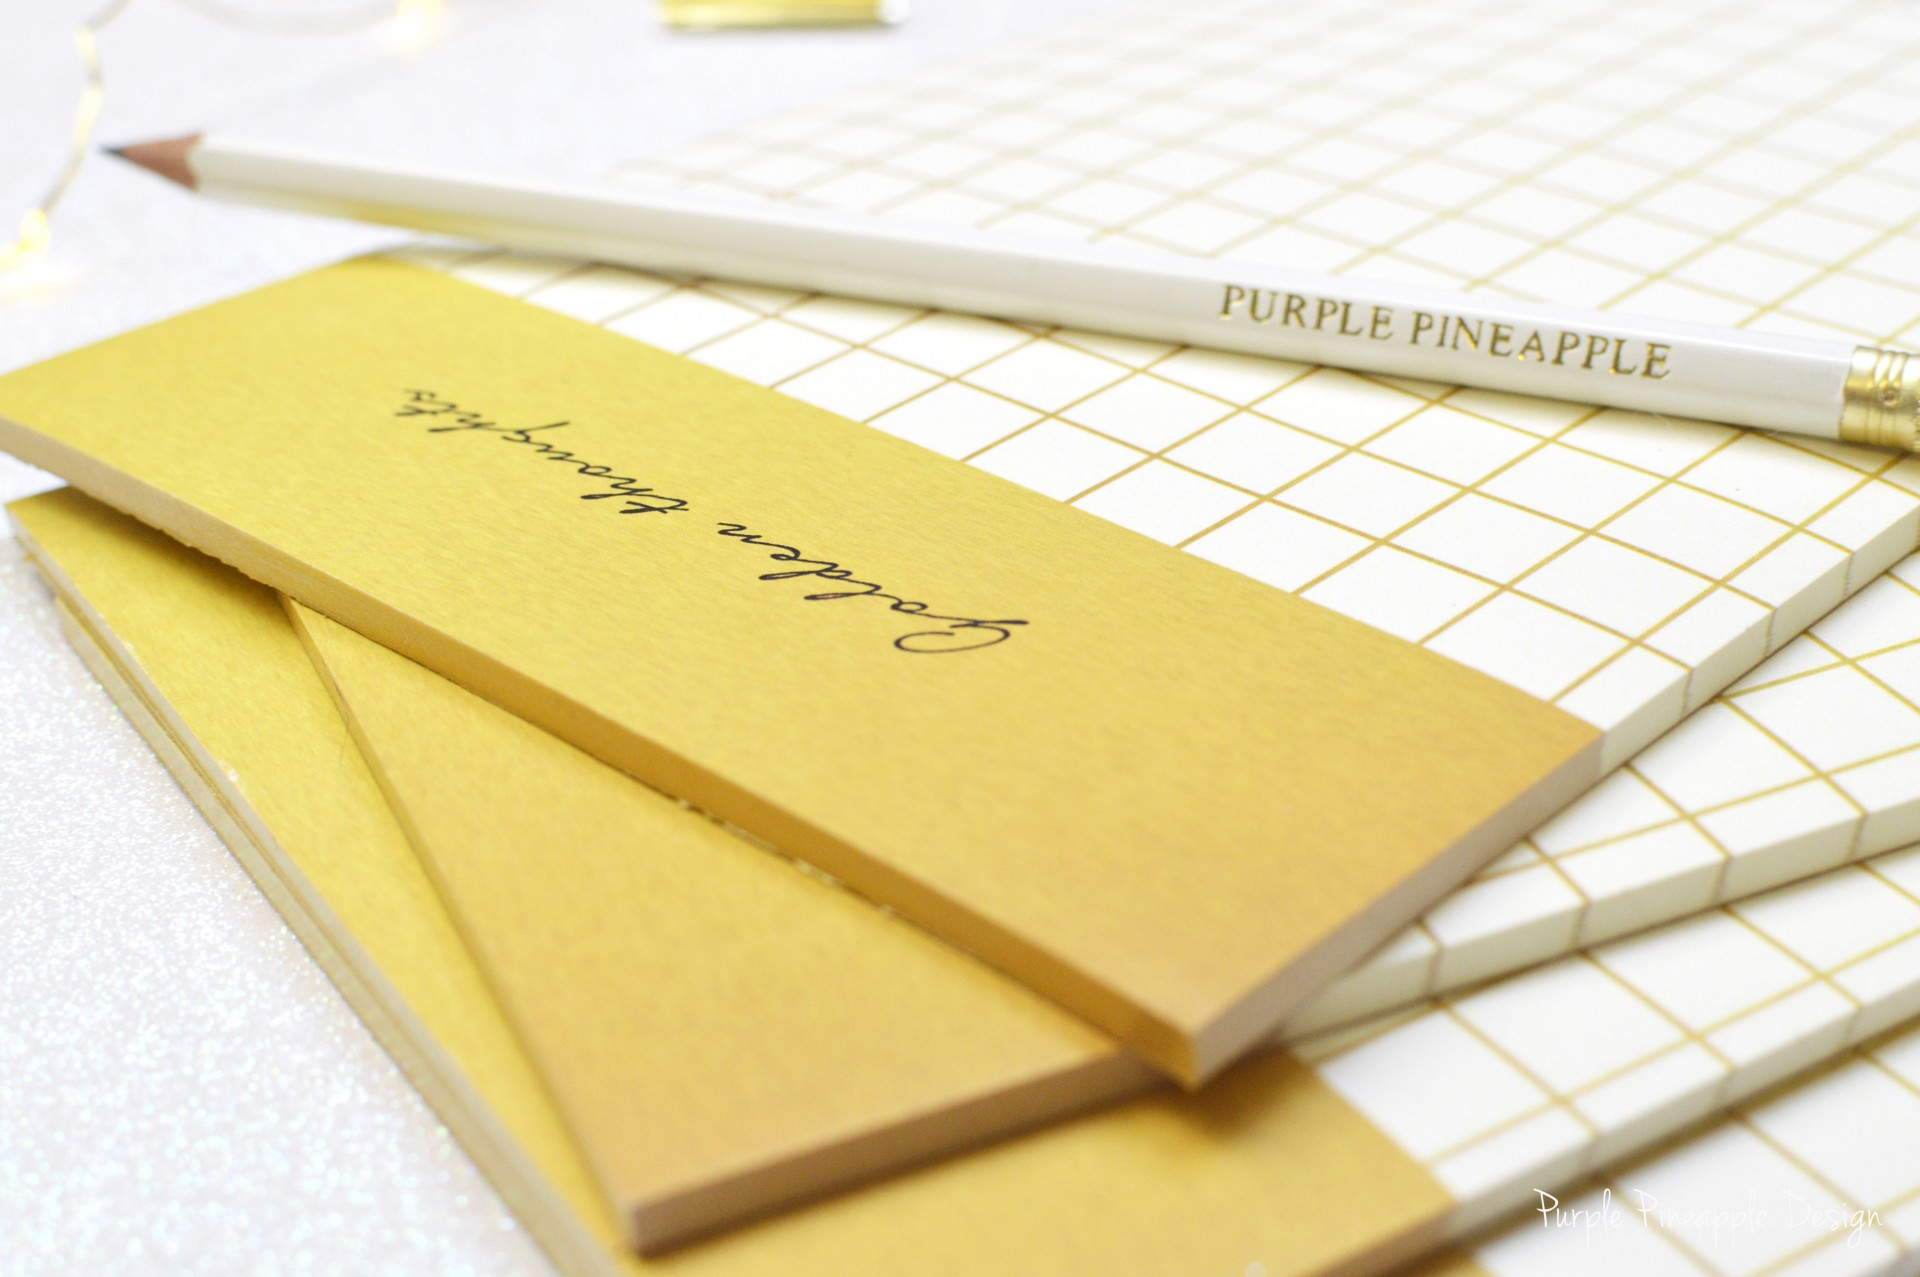 Golden thoughts - Bloco de notas